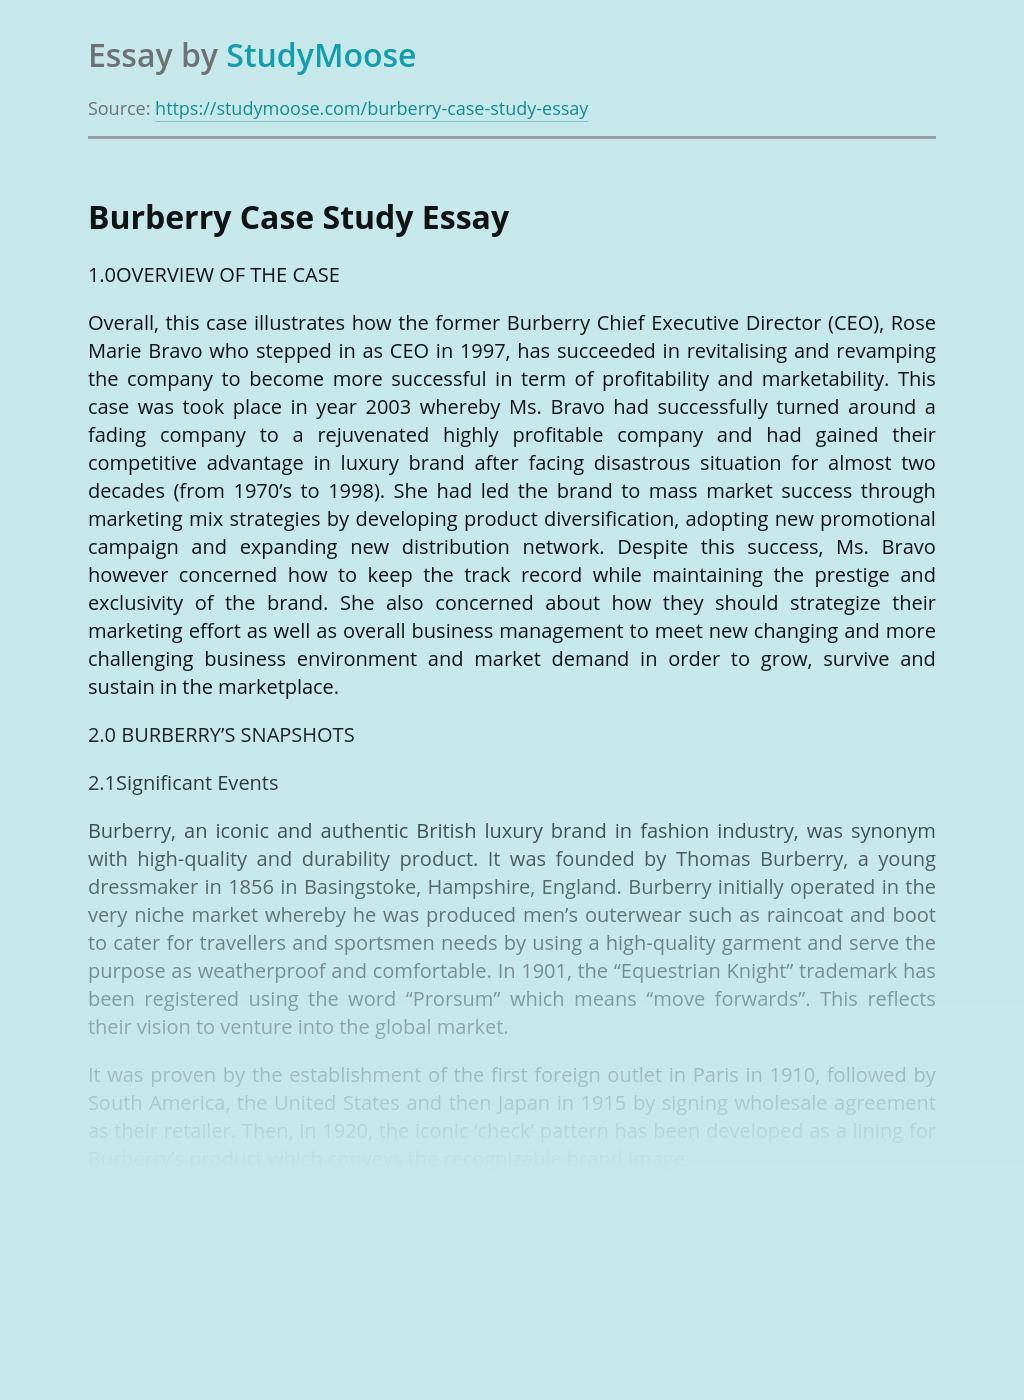 Burberry Case Study